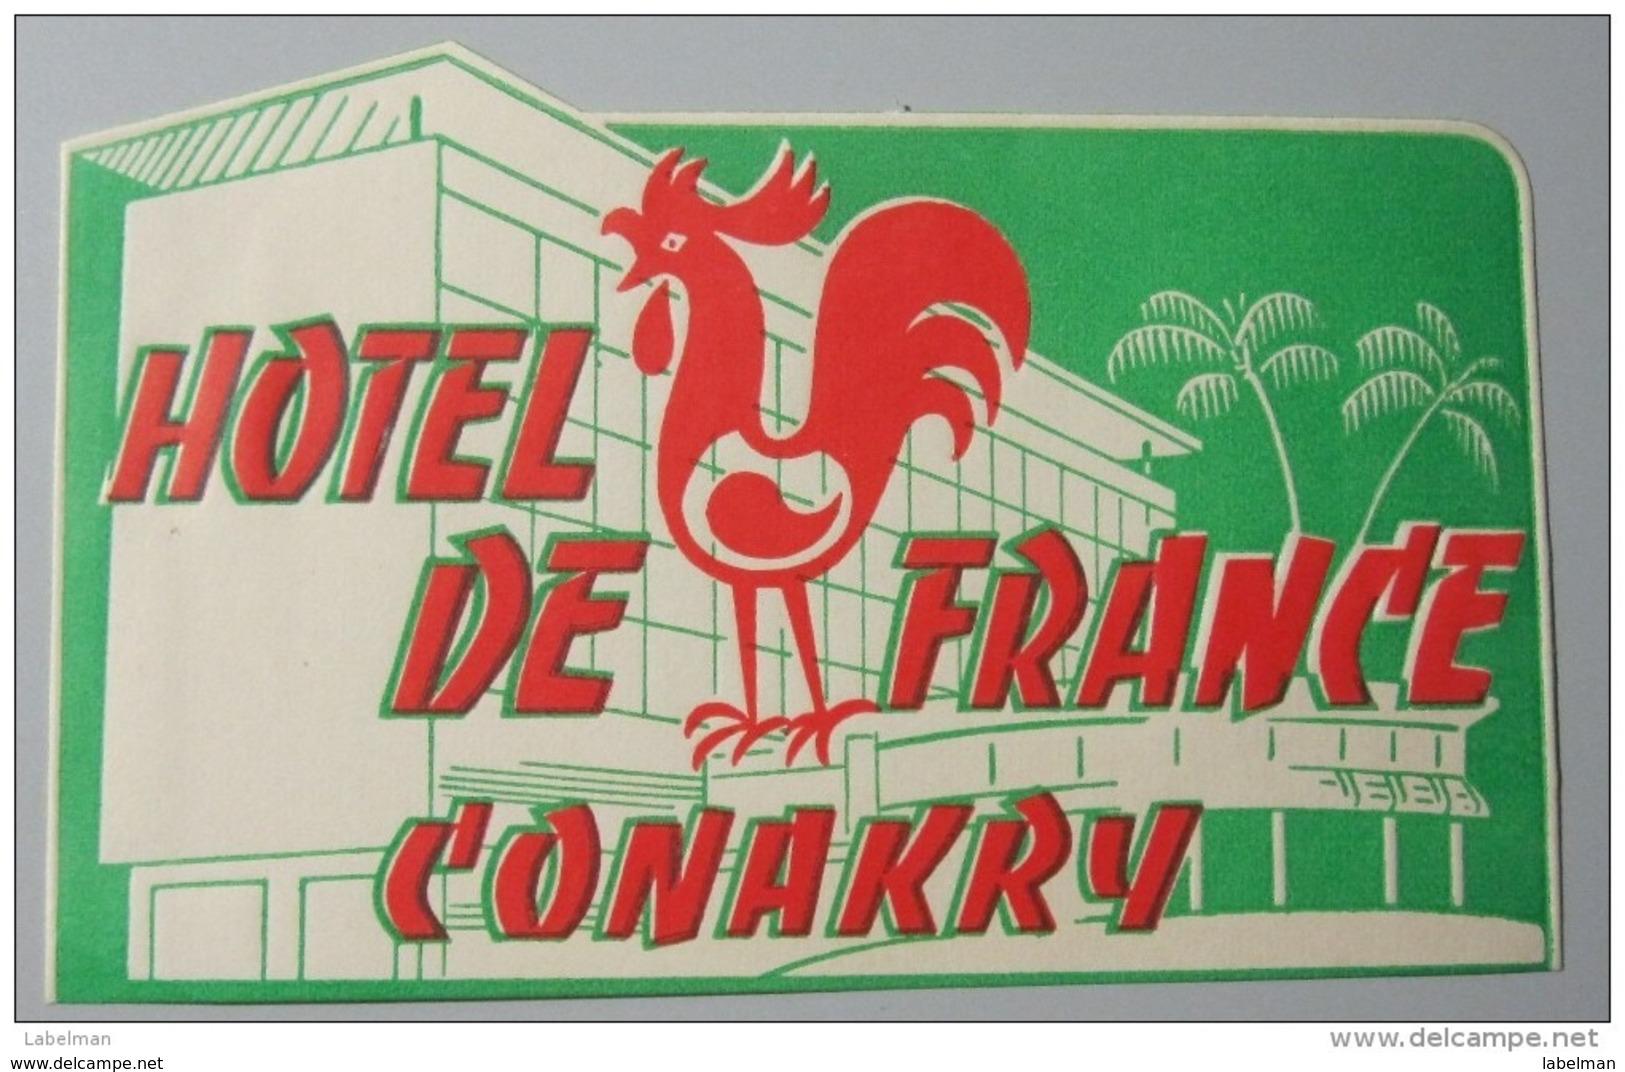 HOTEL AUBERGE MOTEL ONAKRY PARIS FRANCE DECAL STICKER VINTAGE LUGGAGE LABEL ETIQUETTE AUFKLEBER - Etiketten Van Hotels